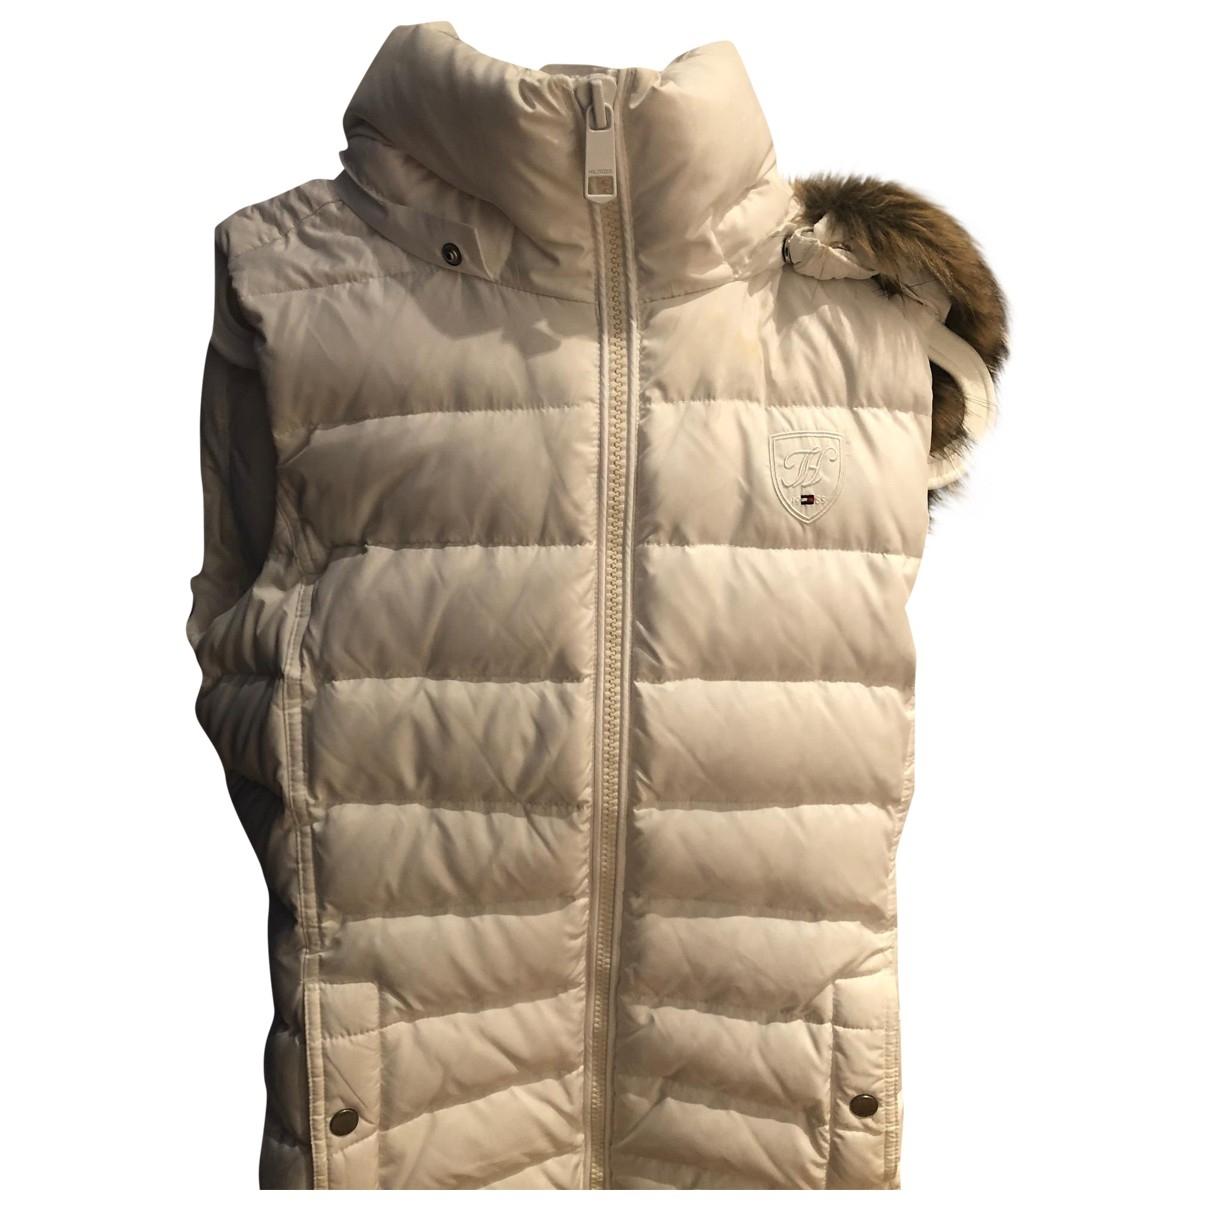 Tommy Hilfiger \N White jacket for Women S International